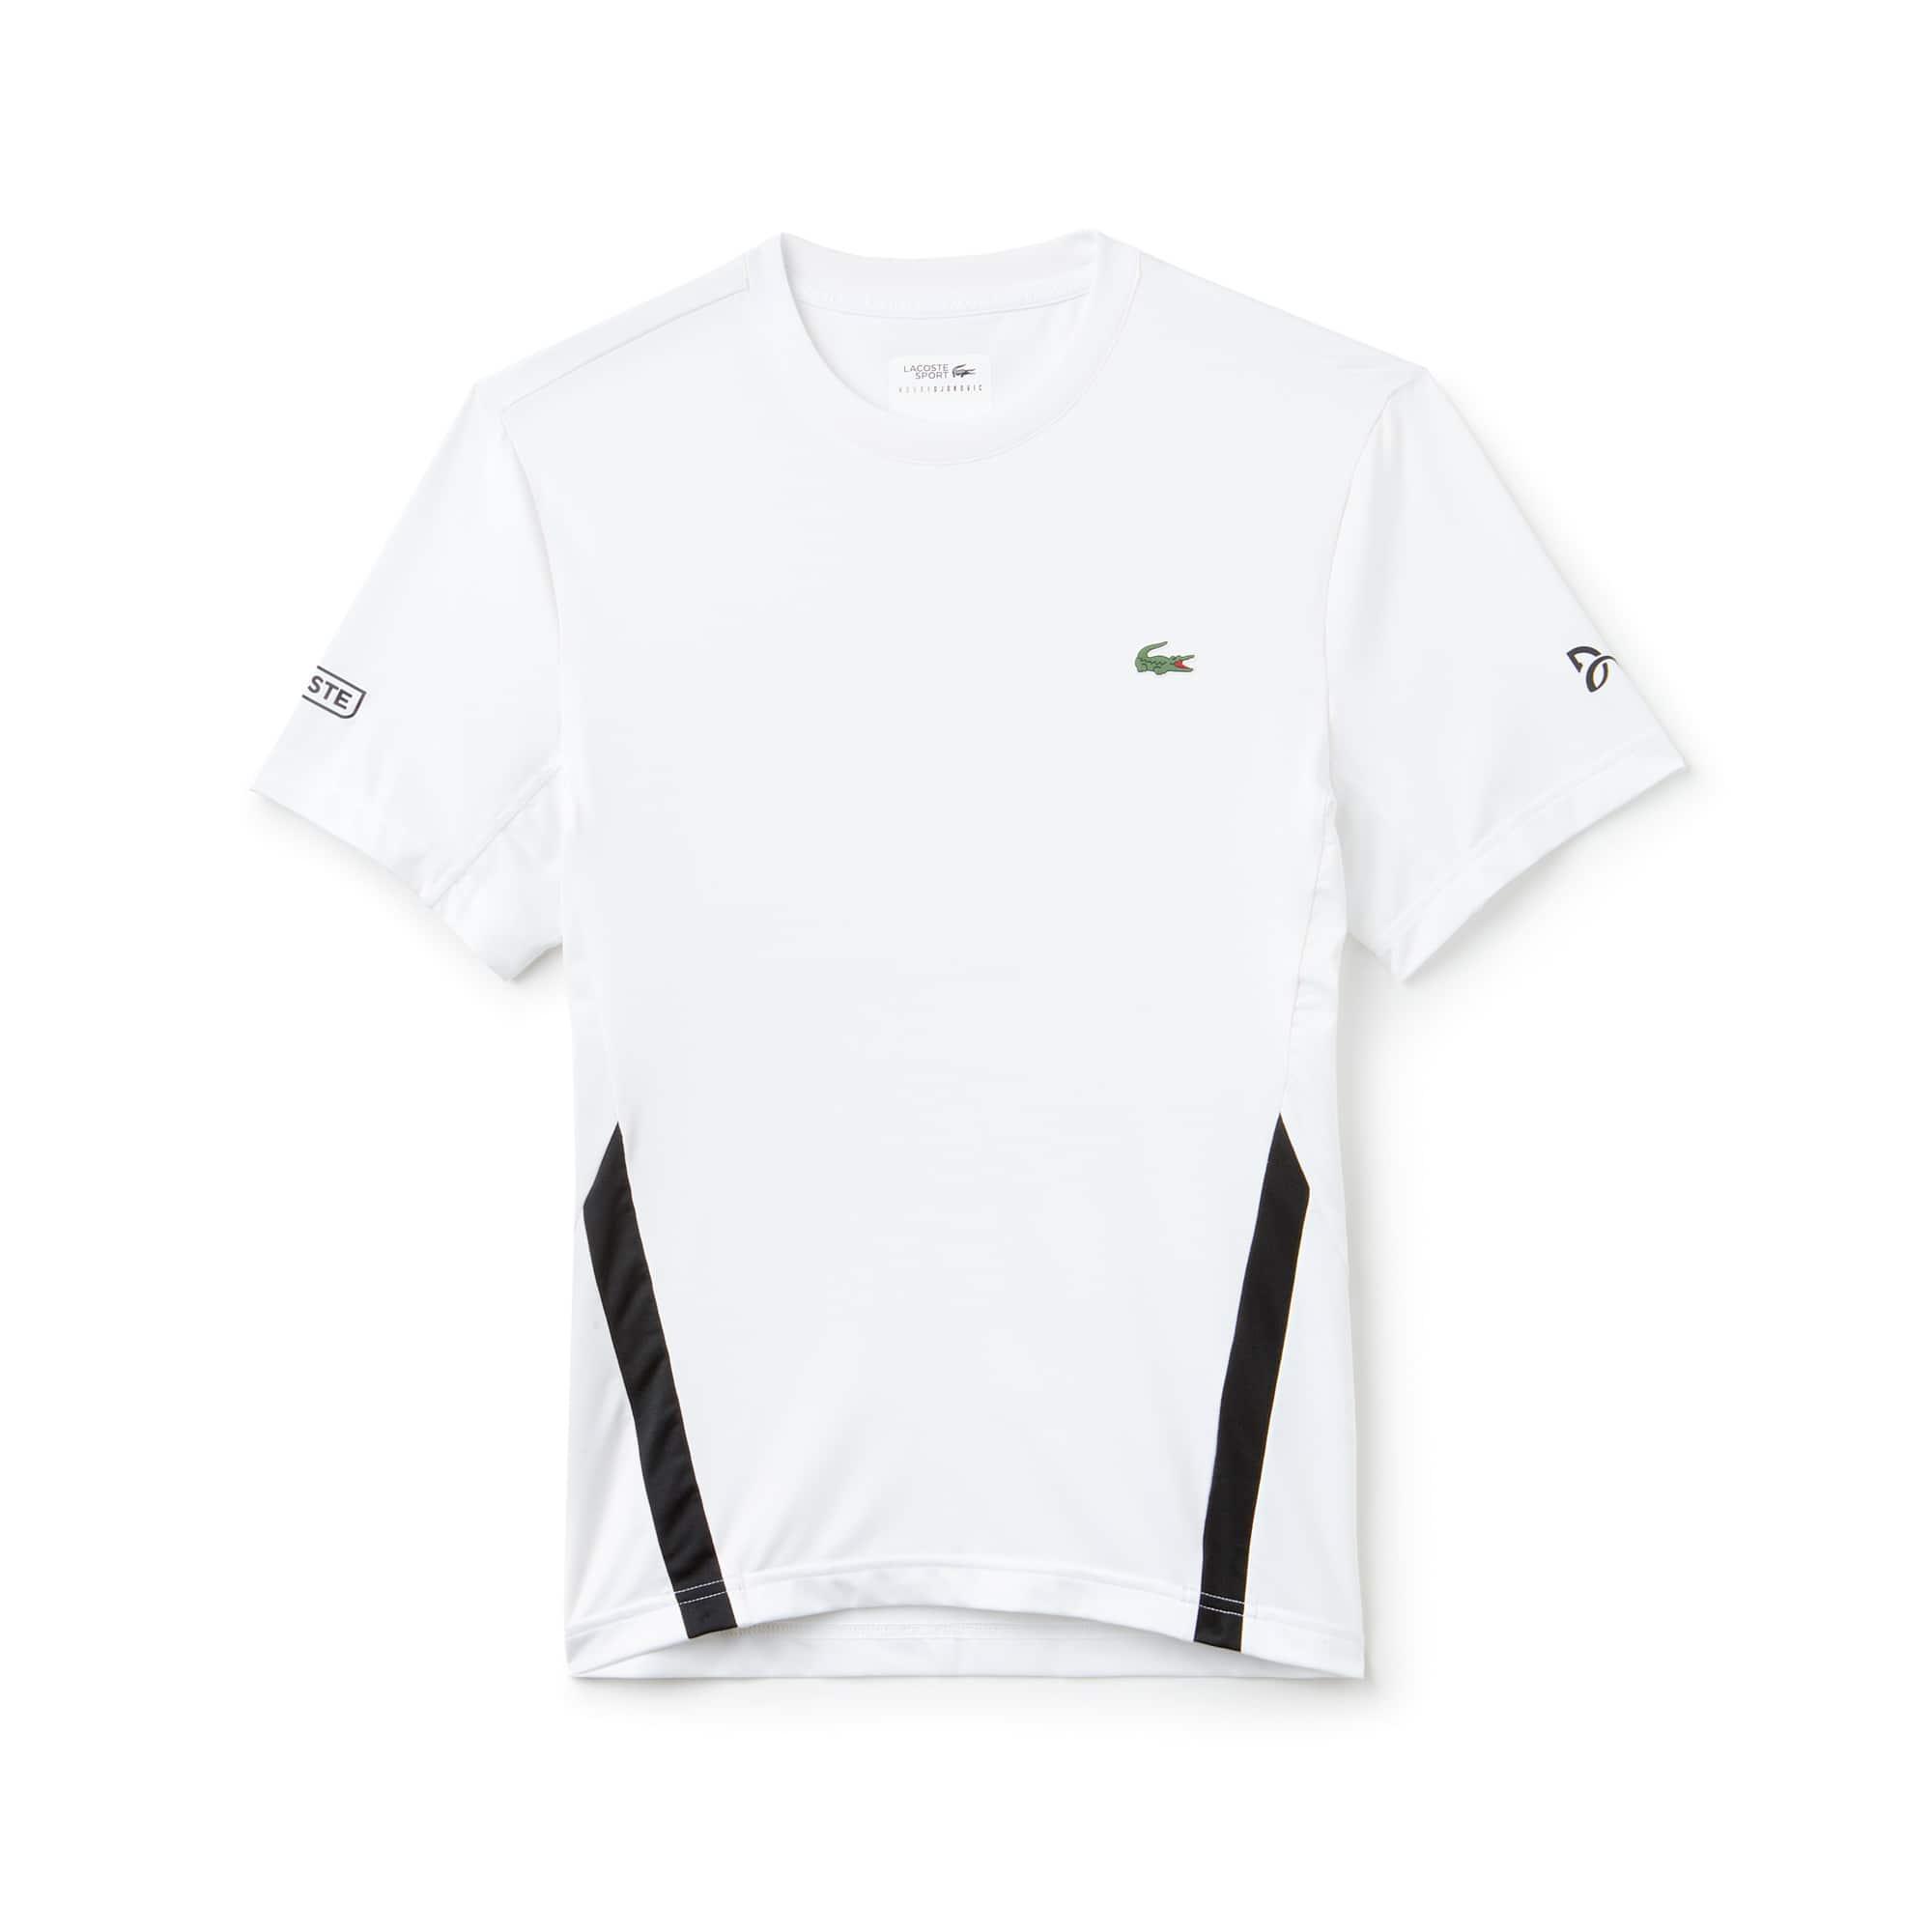 T-shirt a girocollo Lacoste SPORT Collezione Novak Djokovic - Off Court in jersey tecnico stretch